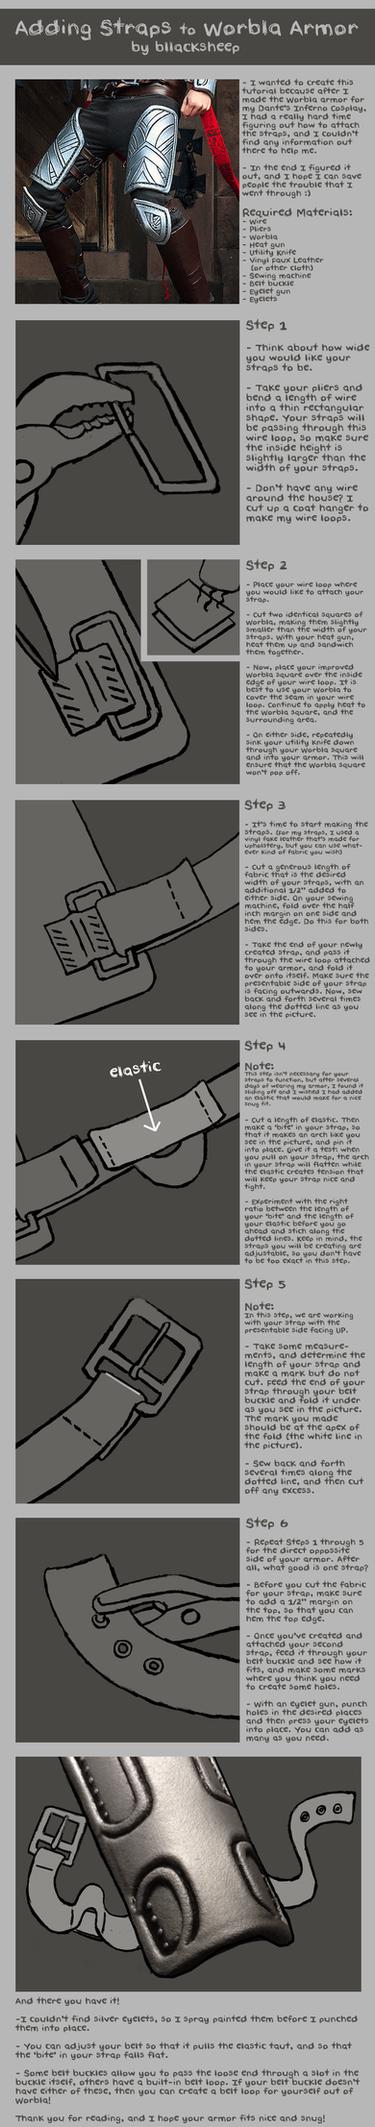 Adding Straps to Worbla Armor Tutorial by Bllacksheep